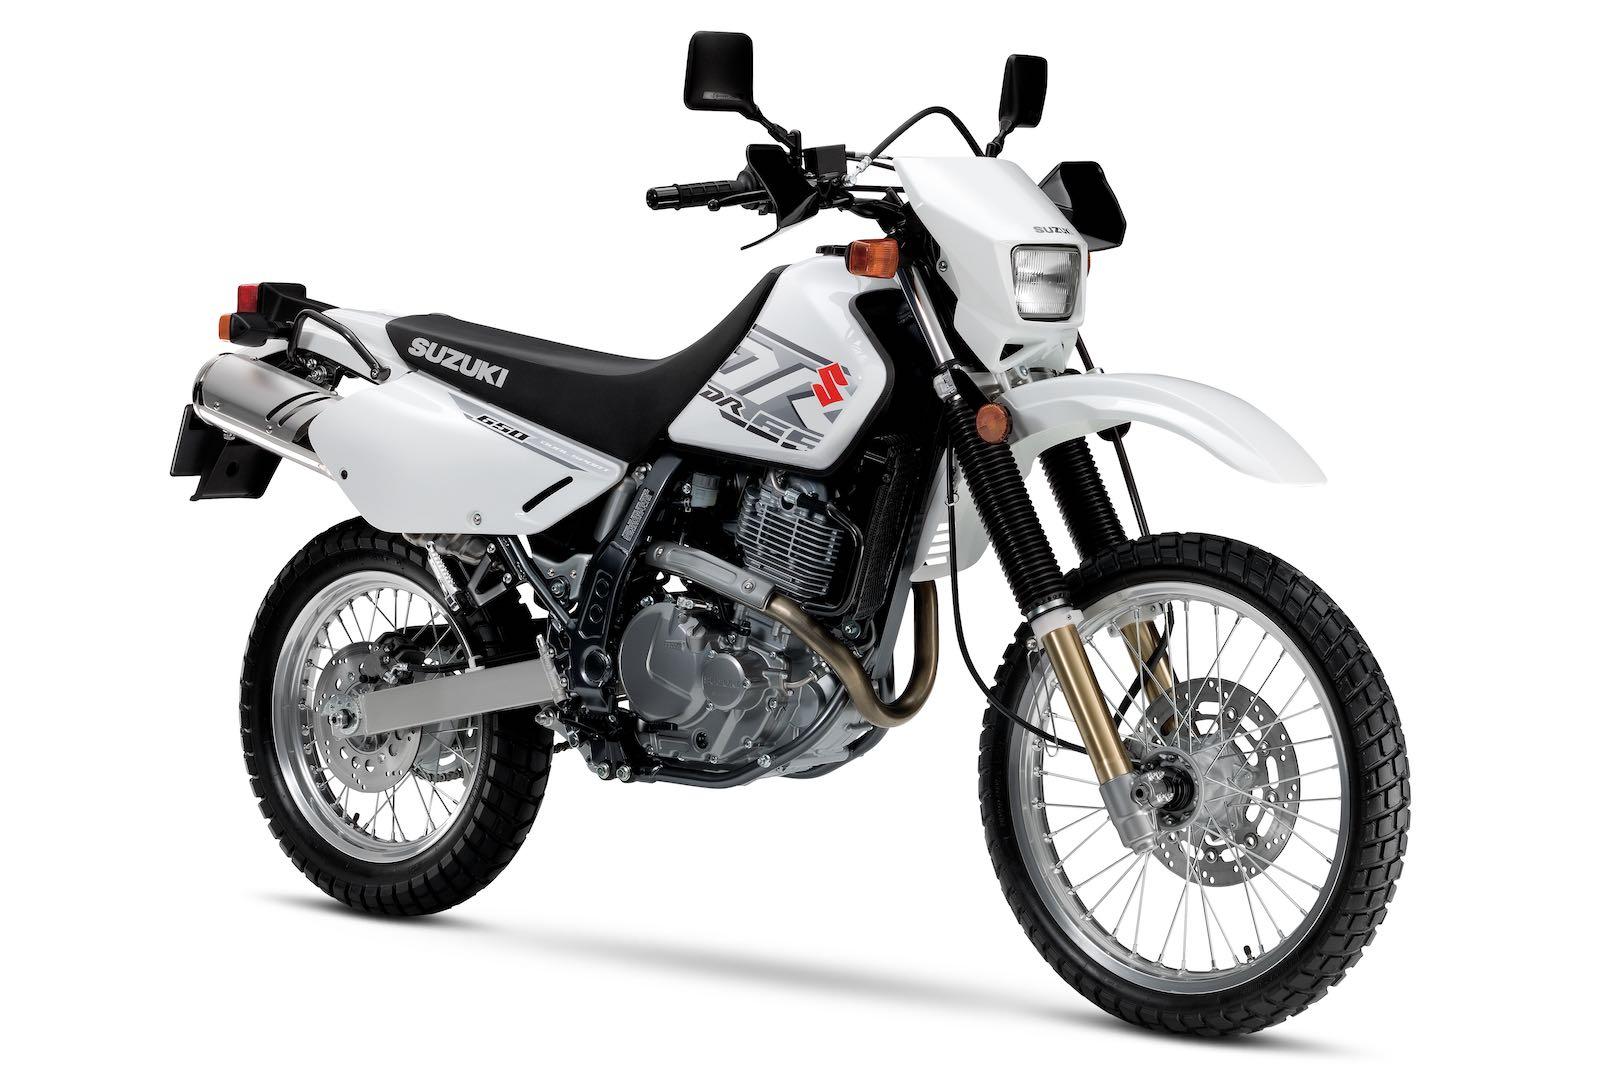 2018 Suzuki DR650S Buyer's Guide | Specs & Price